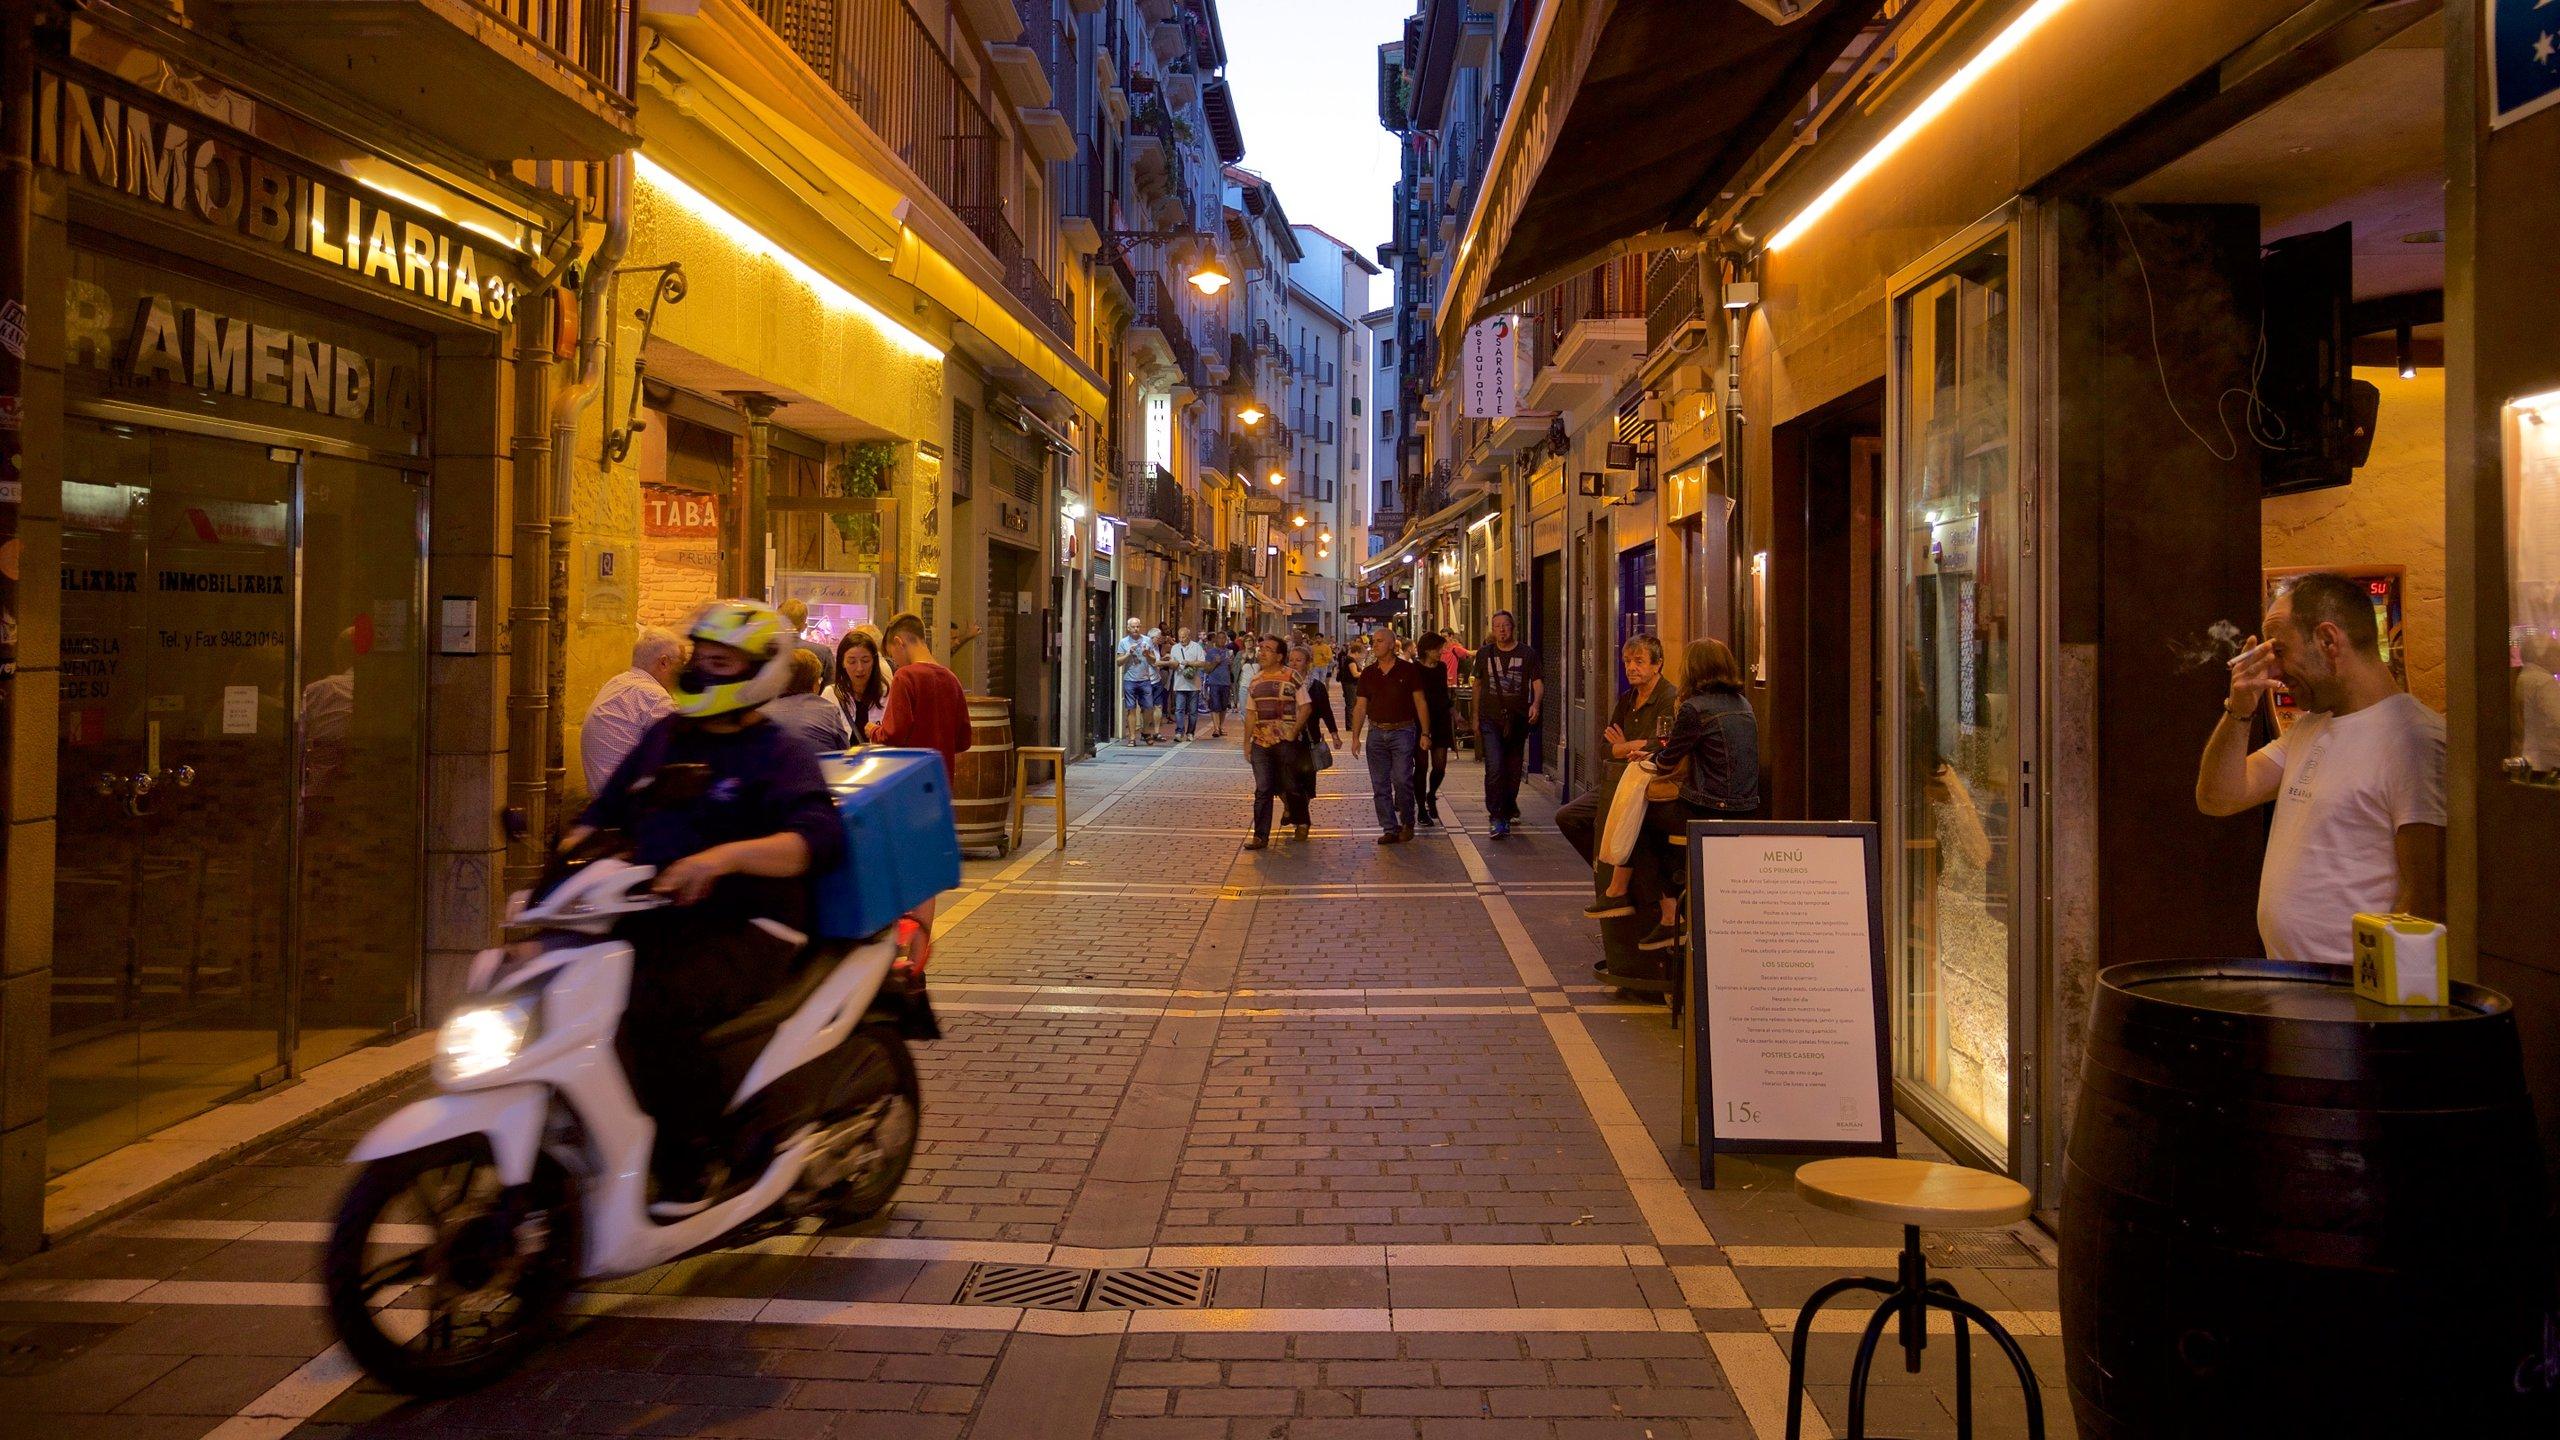 Old Town Pamplona, Pamplona, Navarre, Spain